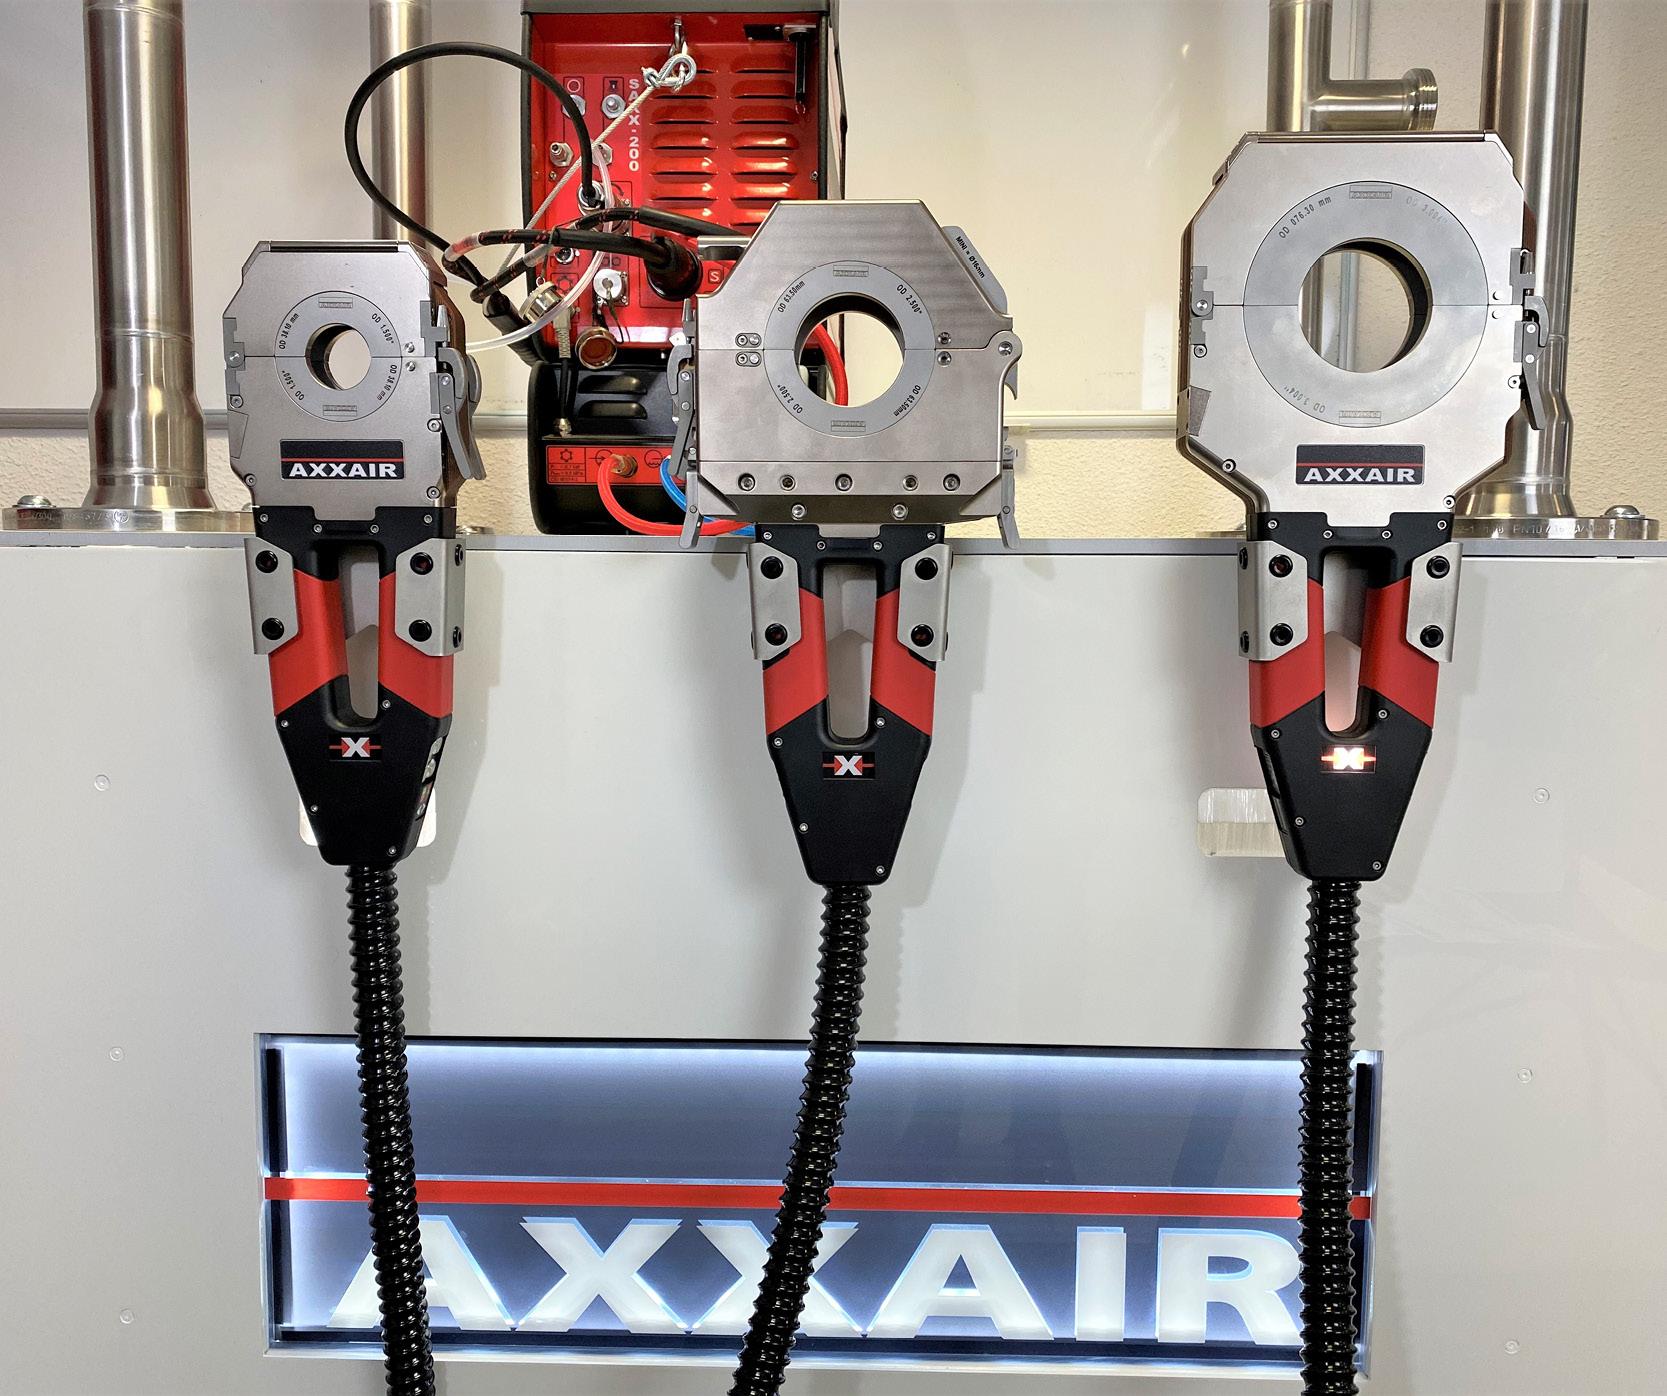 SATFX: New range of orbital closed welding heads for perfect butt welding